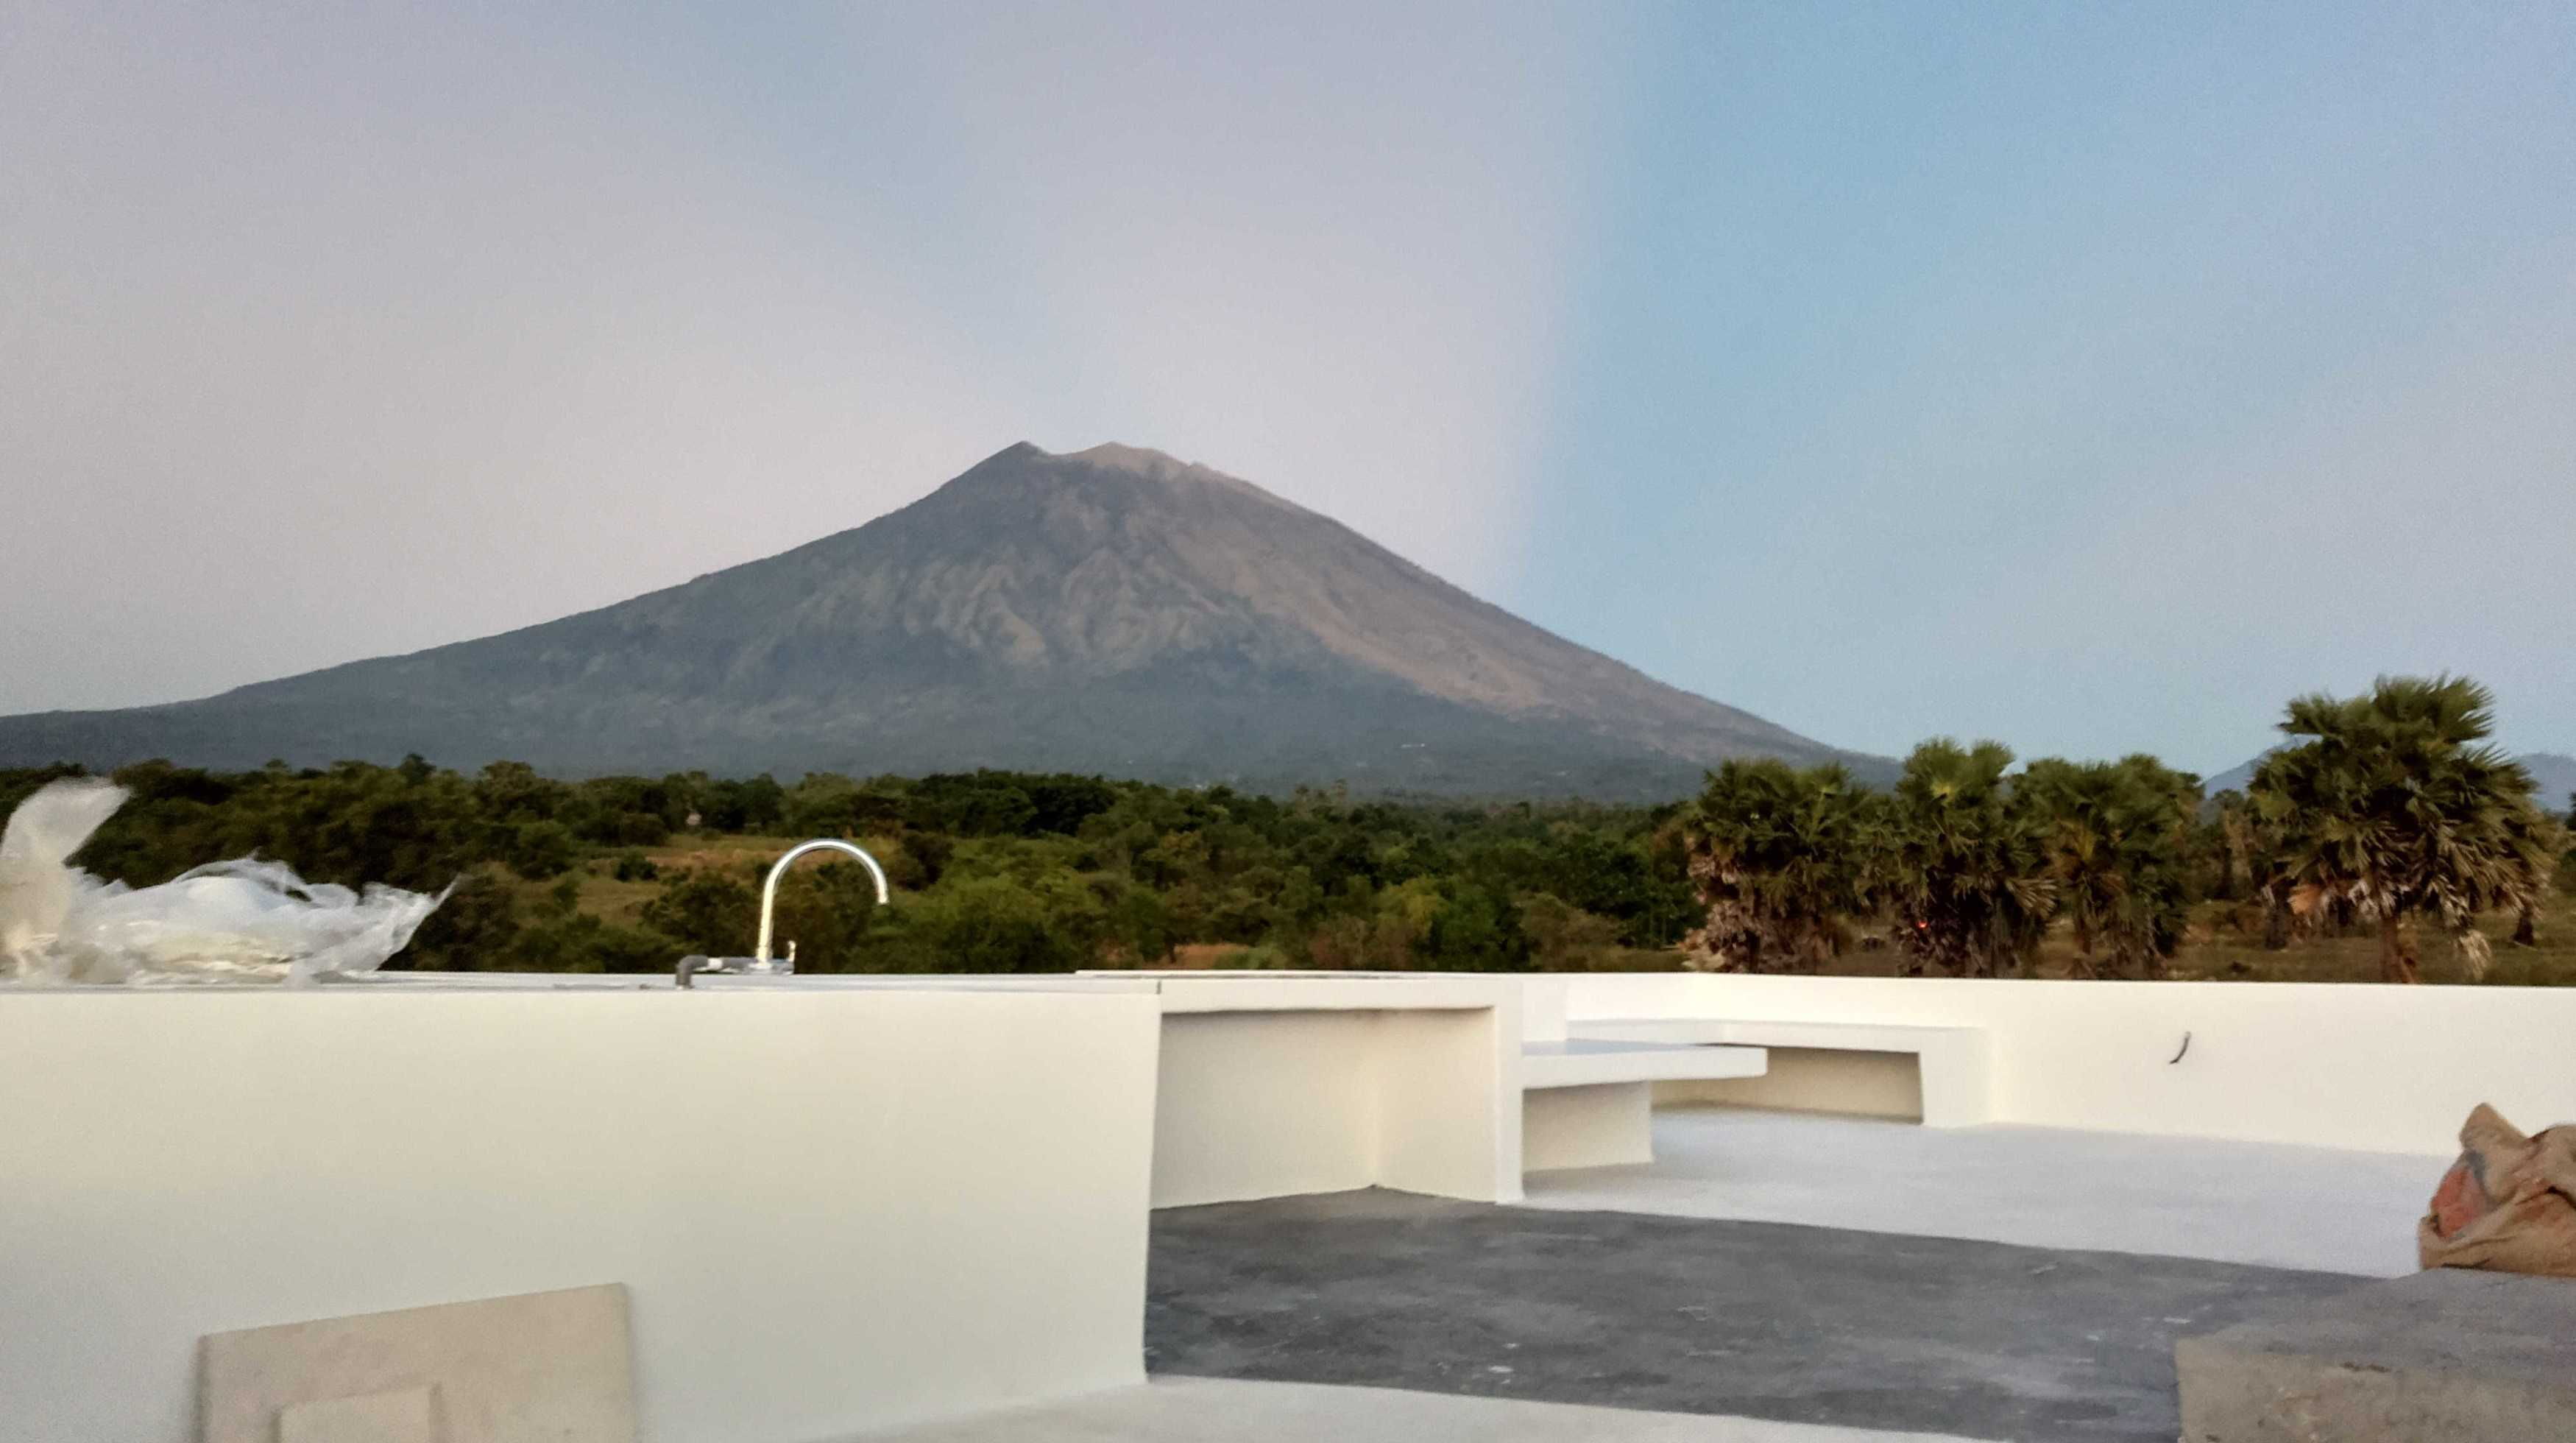 Nuansa Studio Architect Villa Resort Tulamben Bali, Indonesia Bali, Indonesia Nuansa-Studio-Architect-Villa-Resort-Tulamben   56522